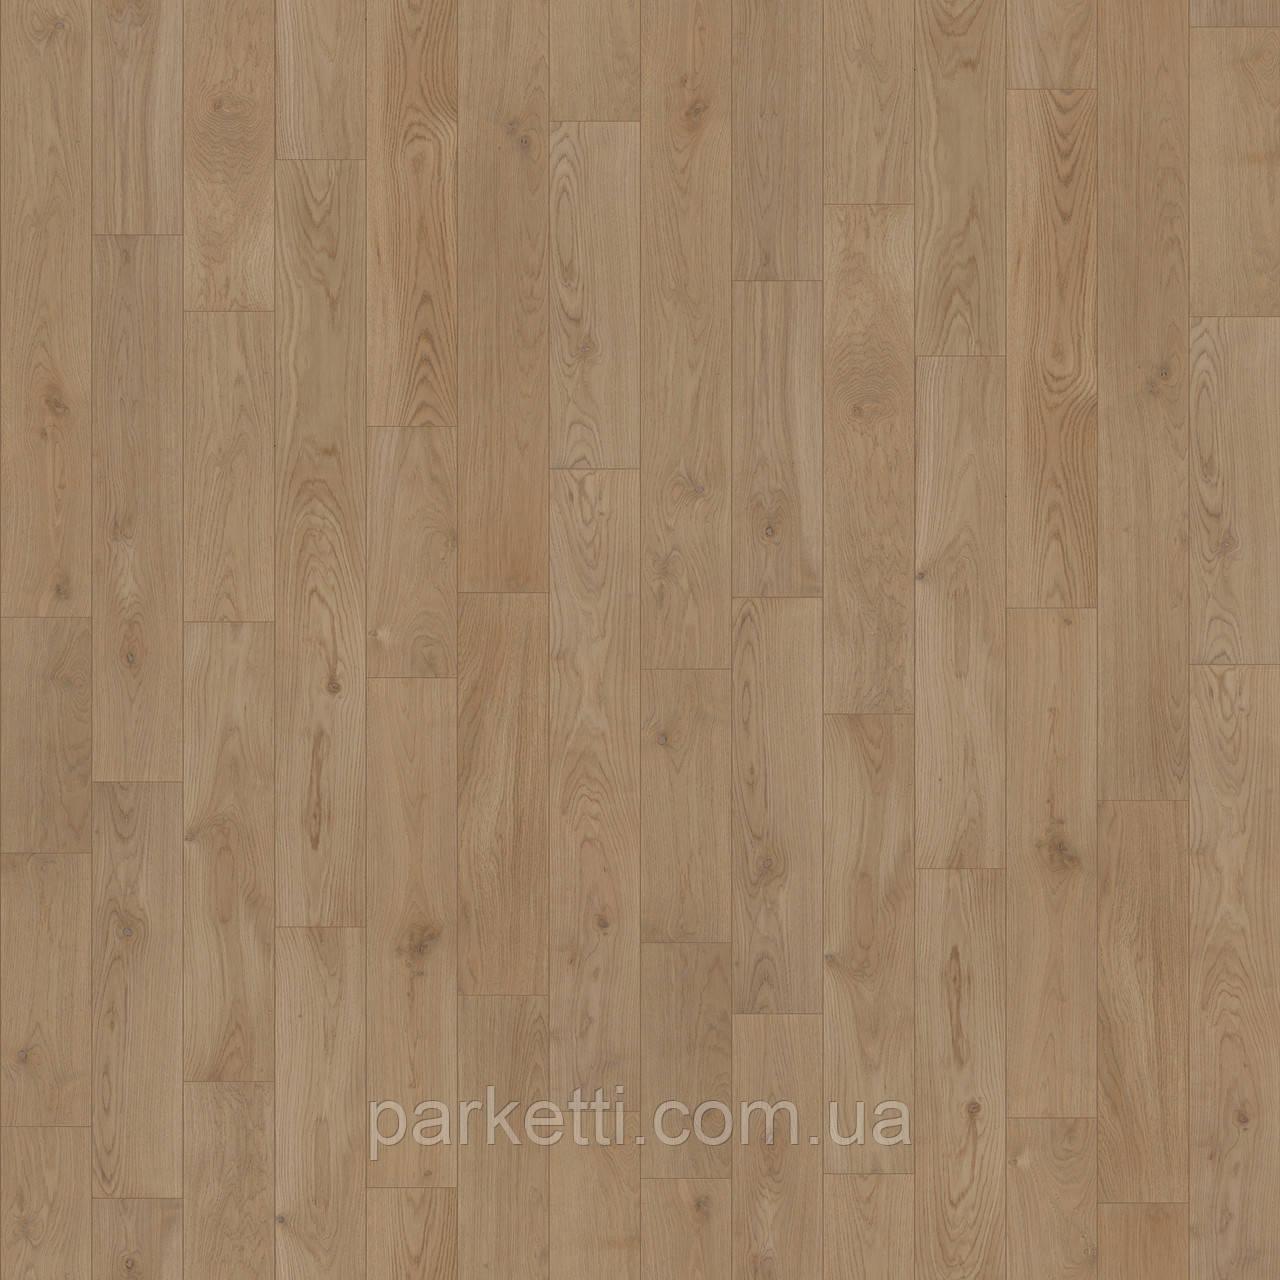 Bonnard Кантри Дуб Тамаринд (Oak Tamarind) инженерная доска, ширина 127 мм